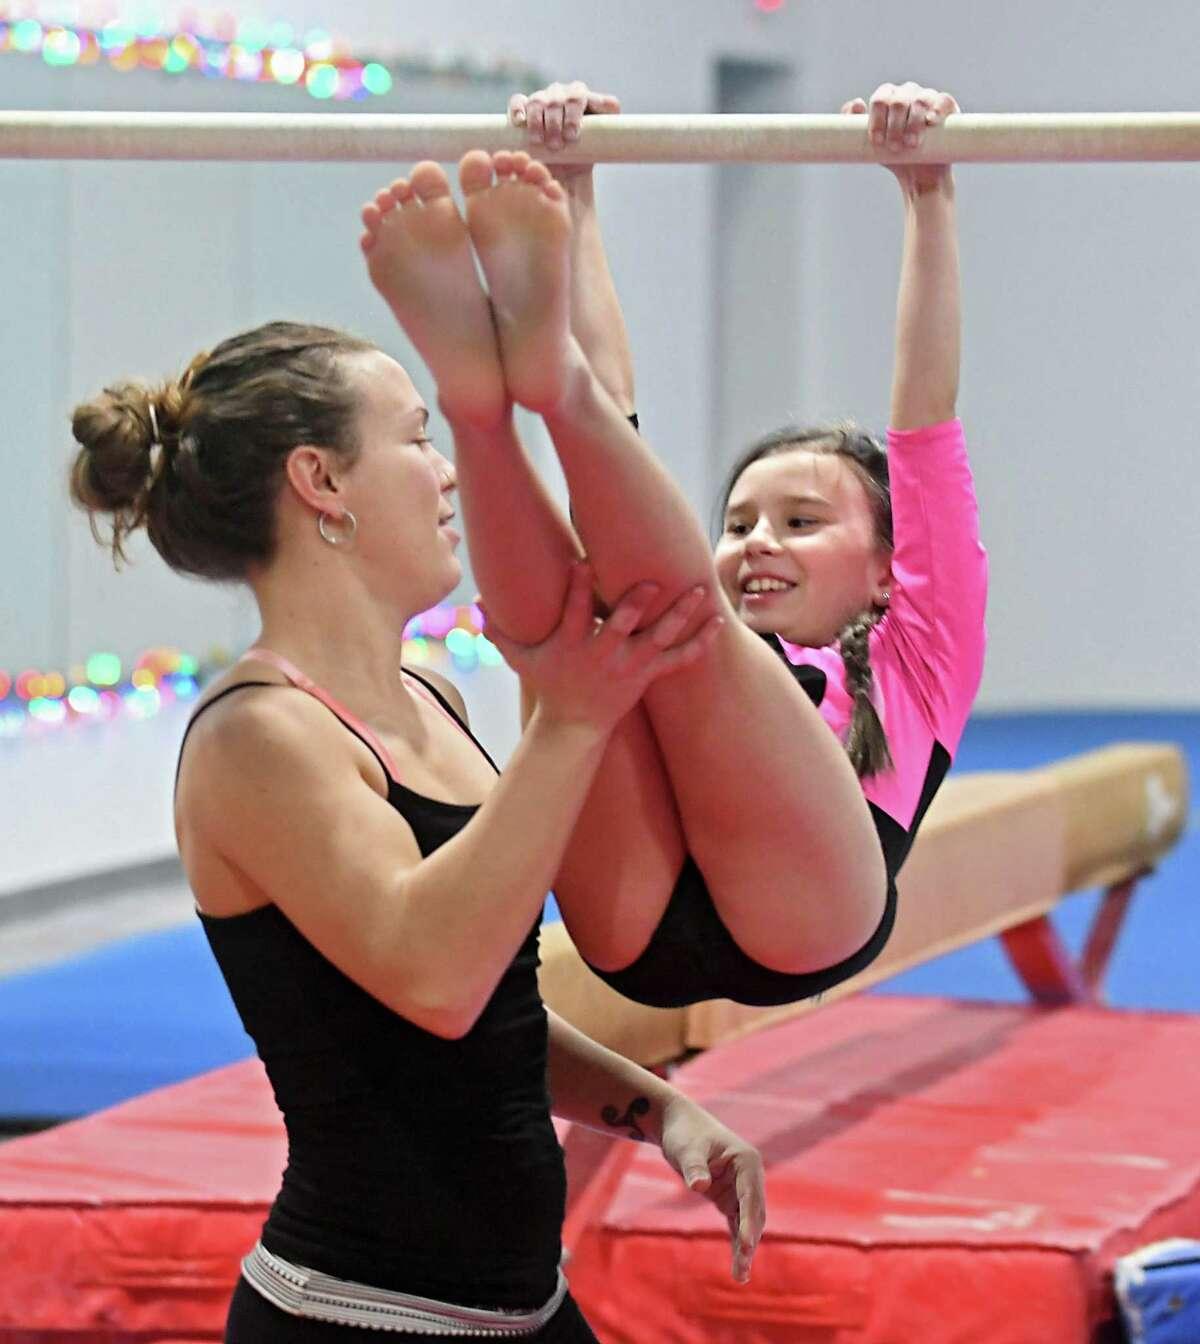 Megan Kennedy, 25, works with 8-yr-old Brooke Hakkinen in DC Stars Gymnastics Academy on Thursday, Dec. 21, 2017 in Watervliet, N.Y. Kennedy, a gymnast who grew up training at DC Stars Gymnastics Academy, is now the owner. (Lori Van Buren / Times Union)